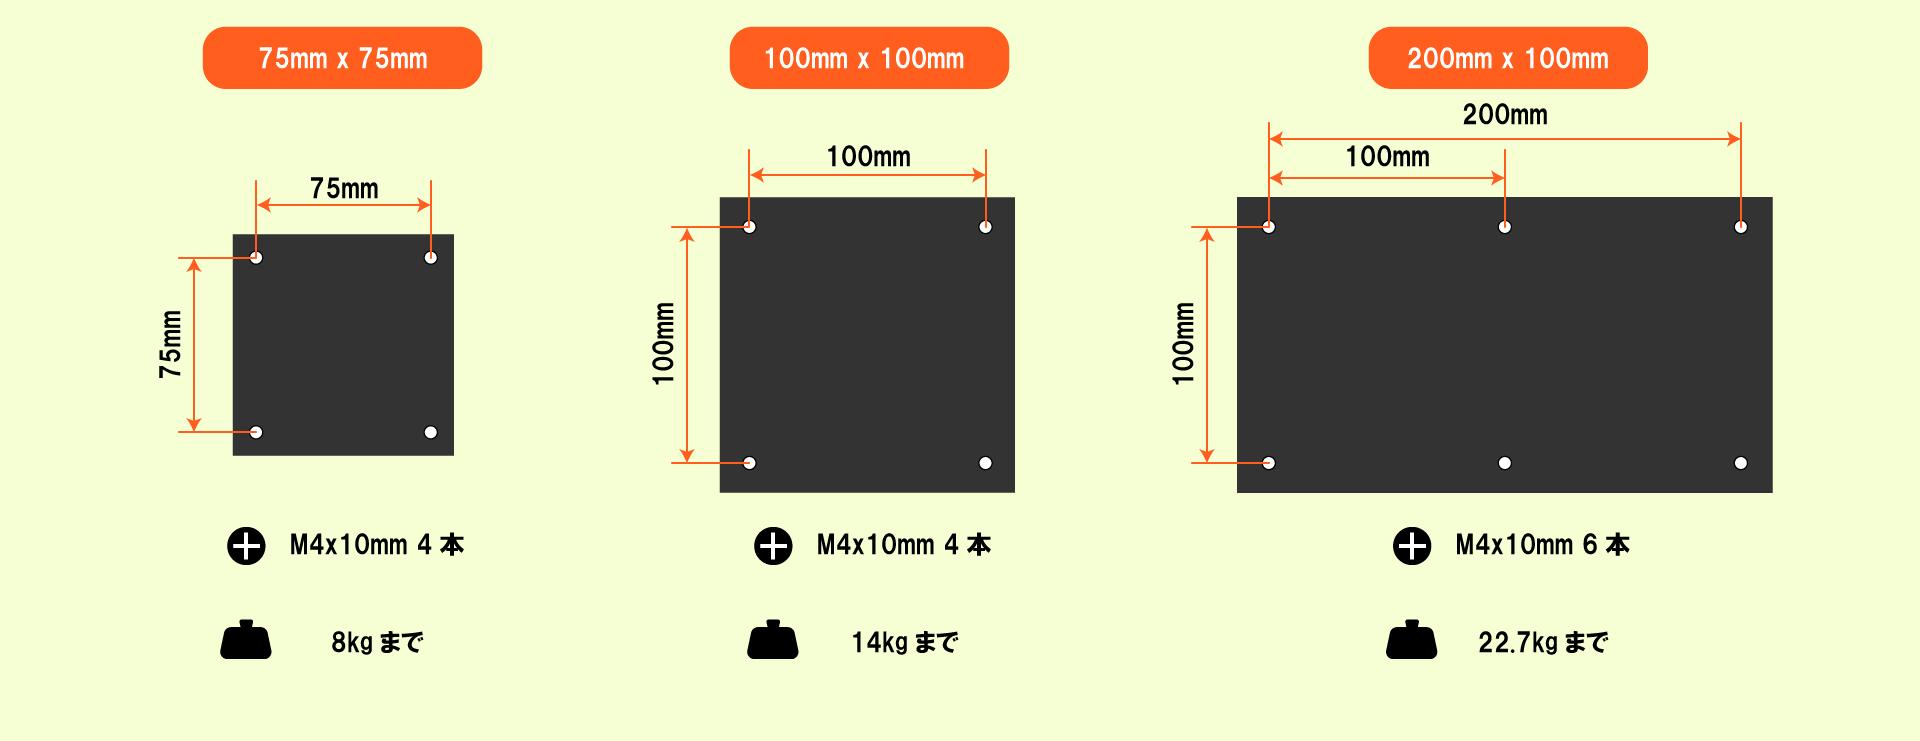 VESAマウント規格 モニターアーム